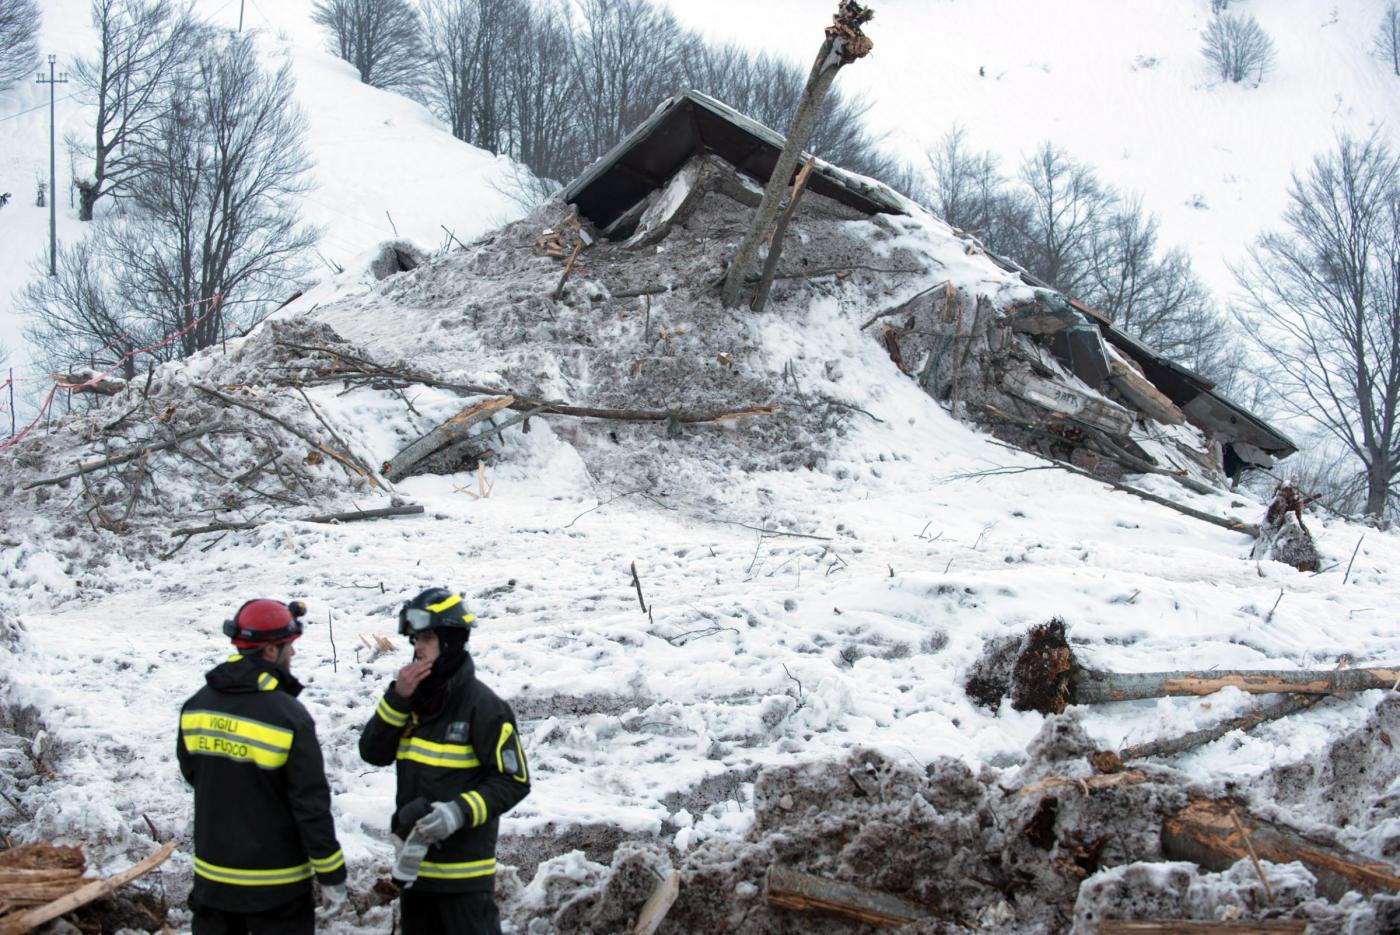 Hotel Rigopiano, le macerie del resort devastato dalla slavina